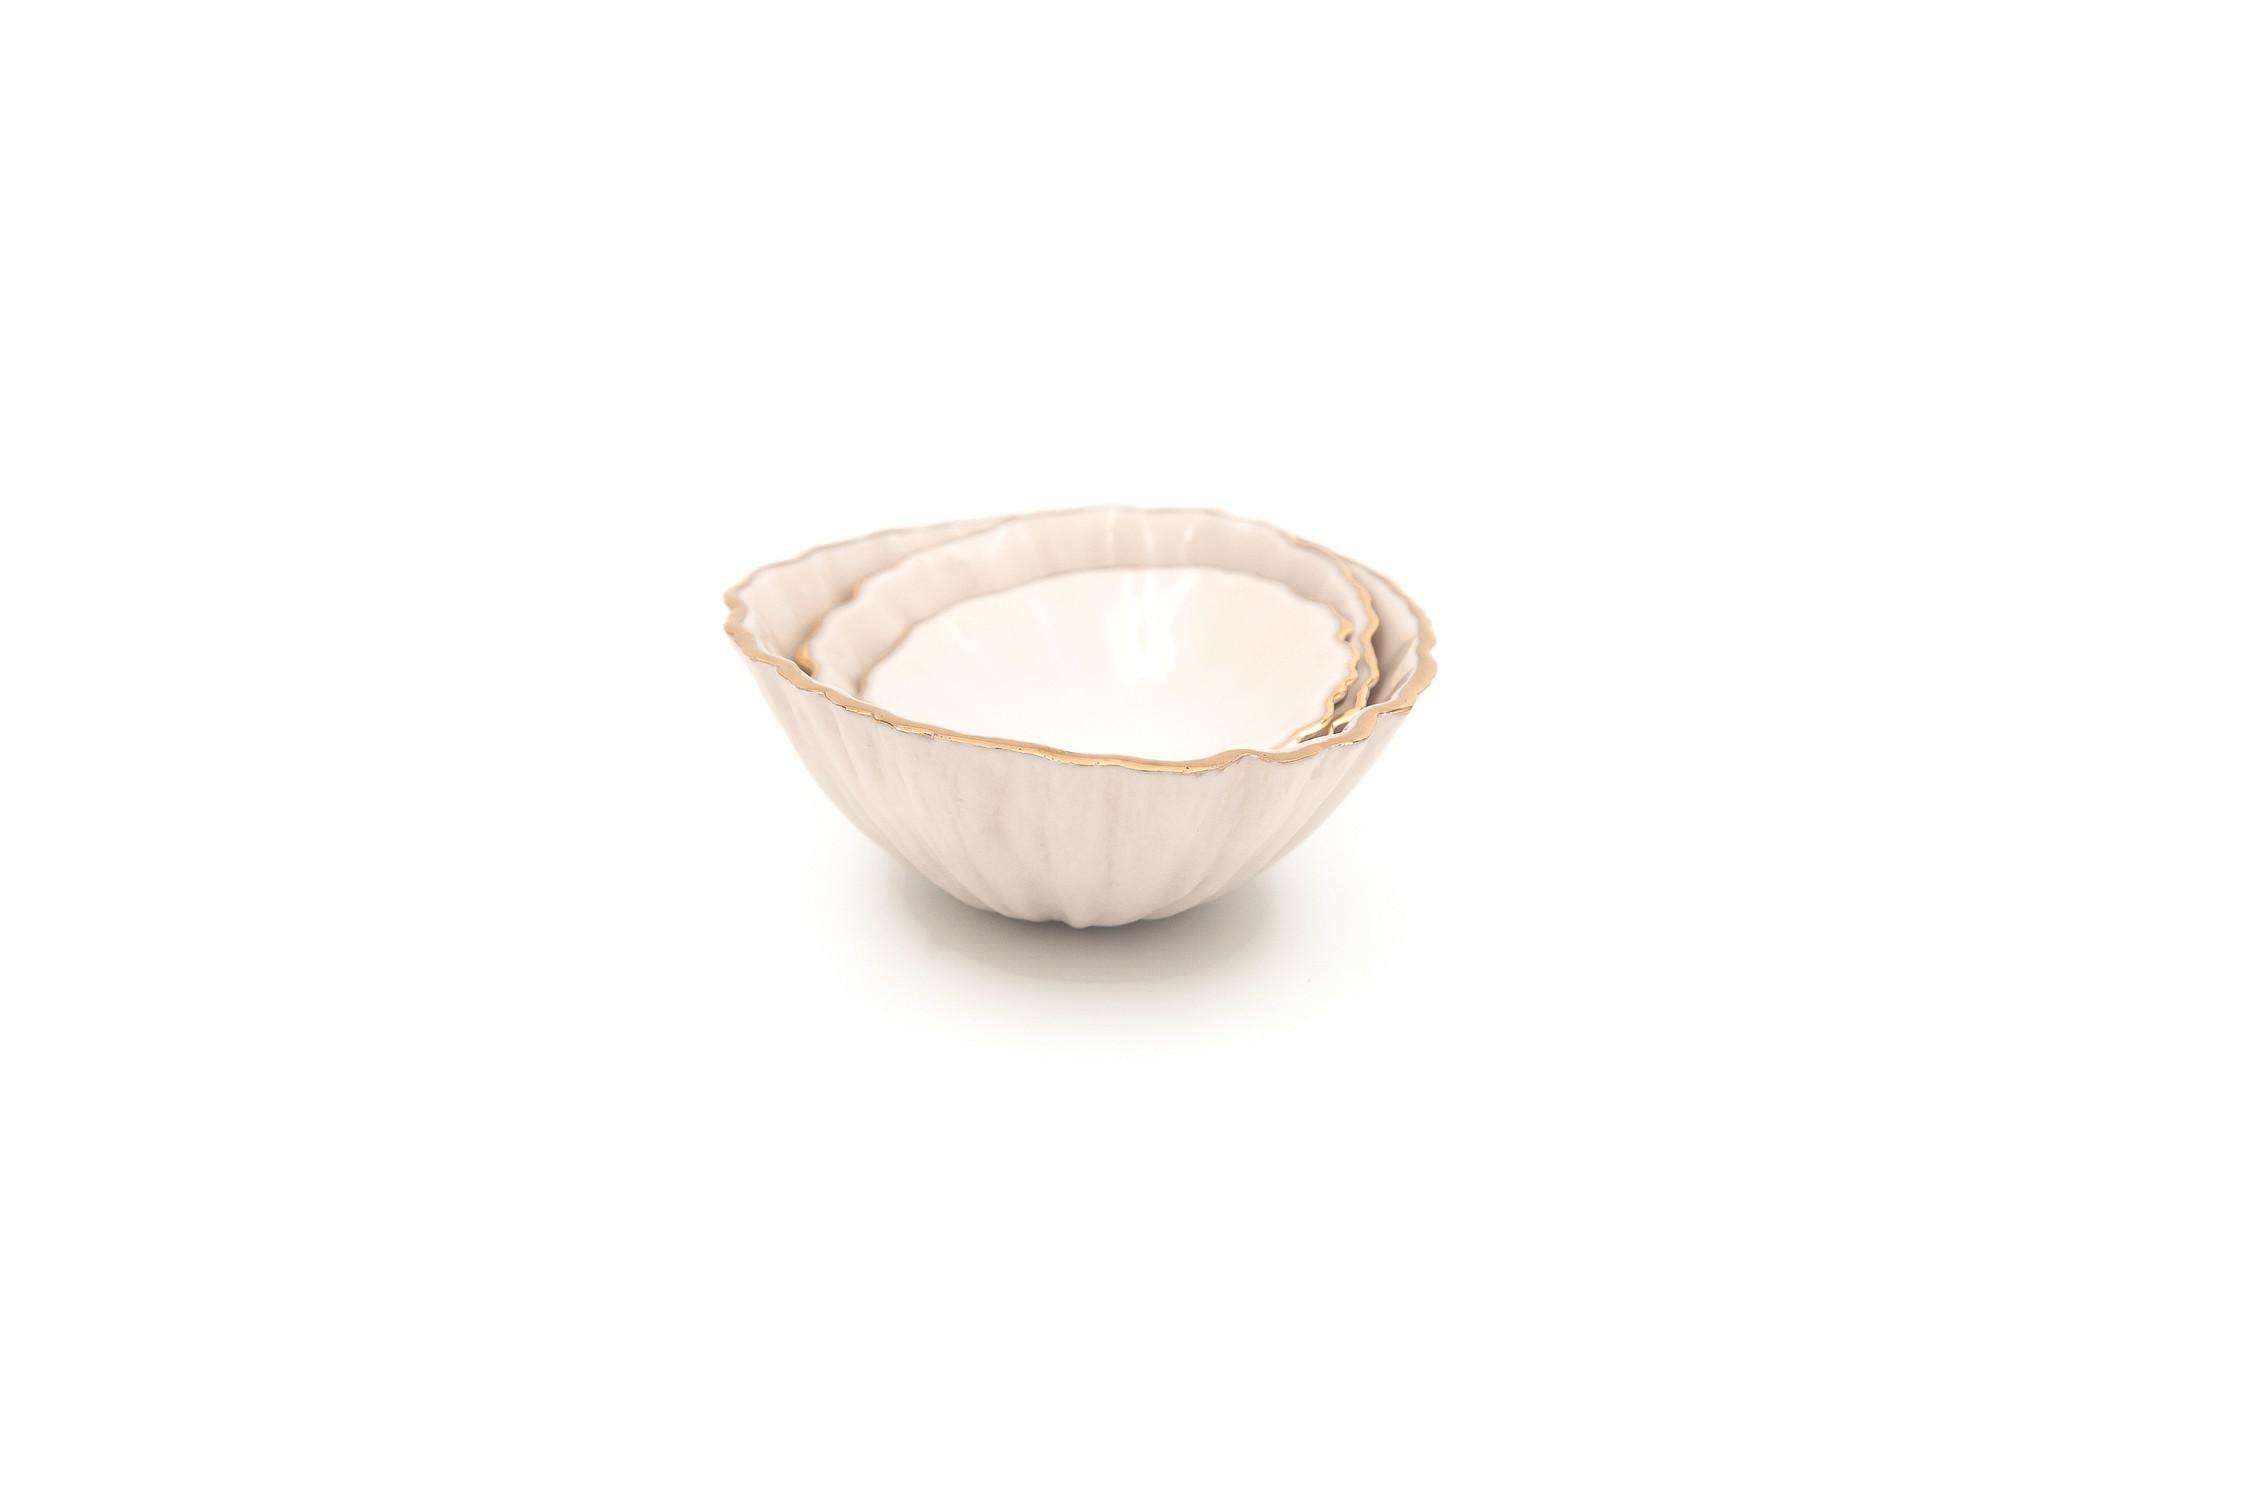 Handmade Porcelain Nesting Bowls (Set of 3)....